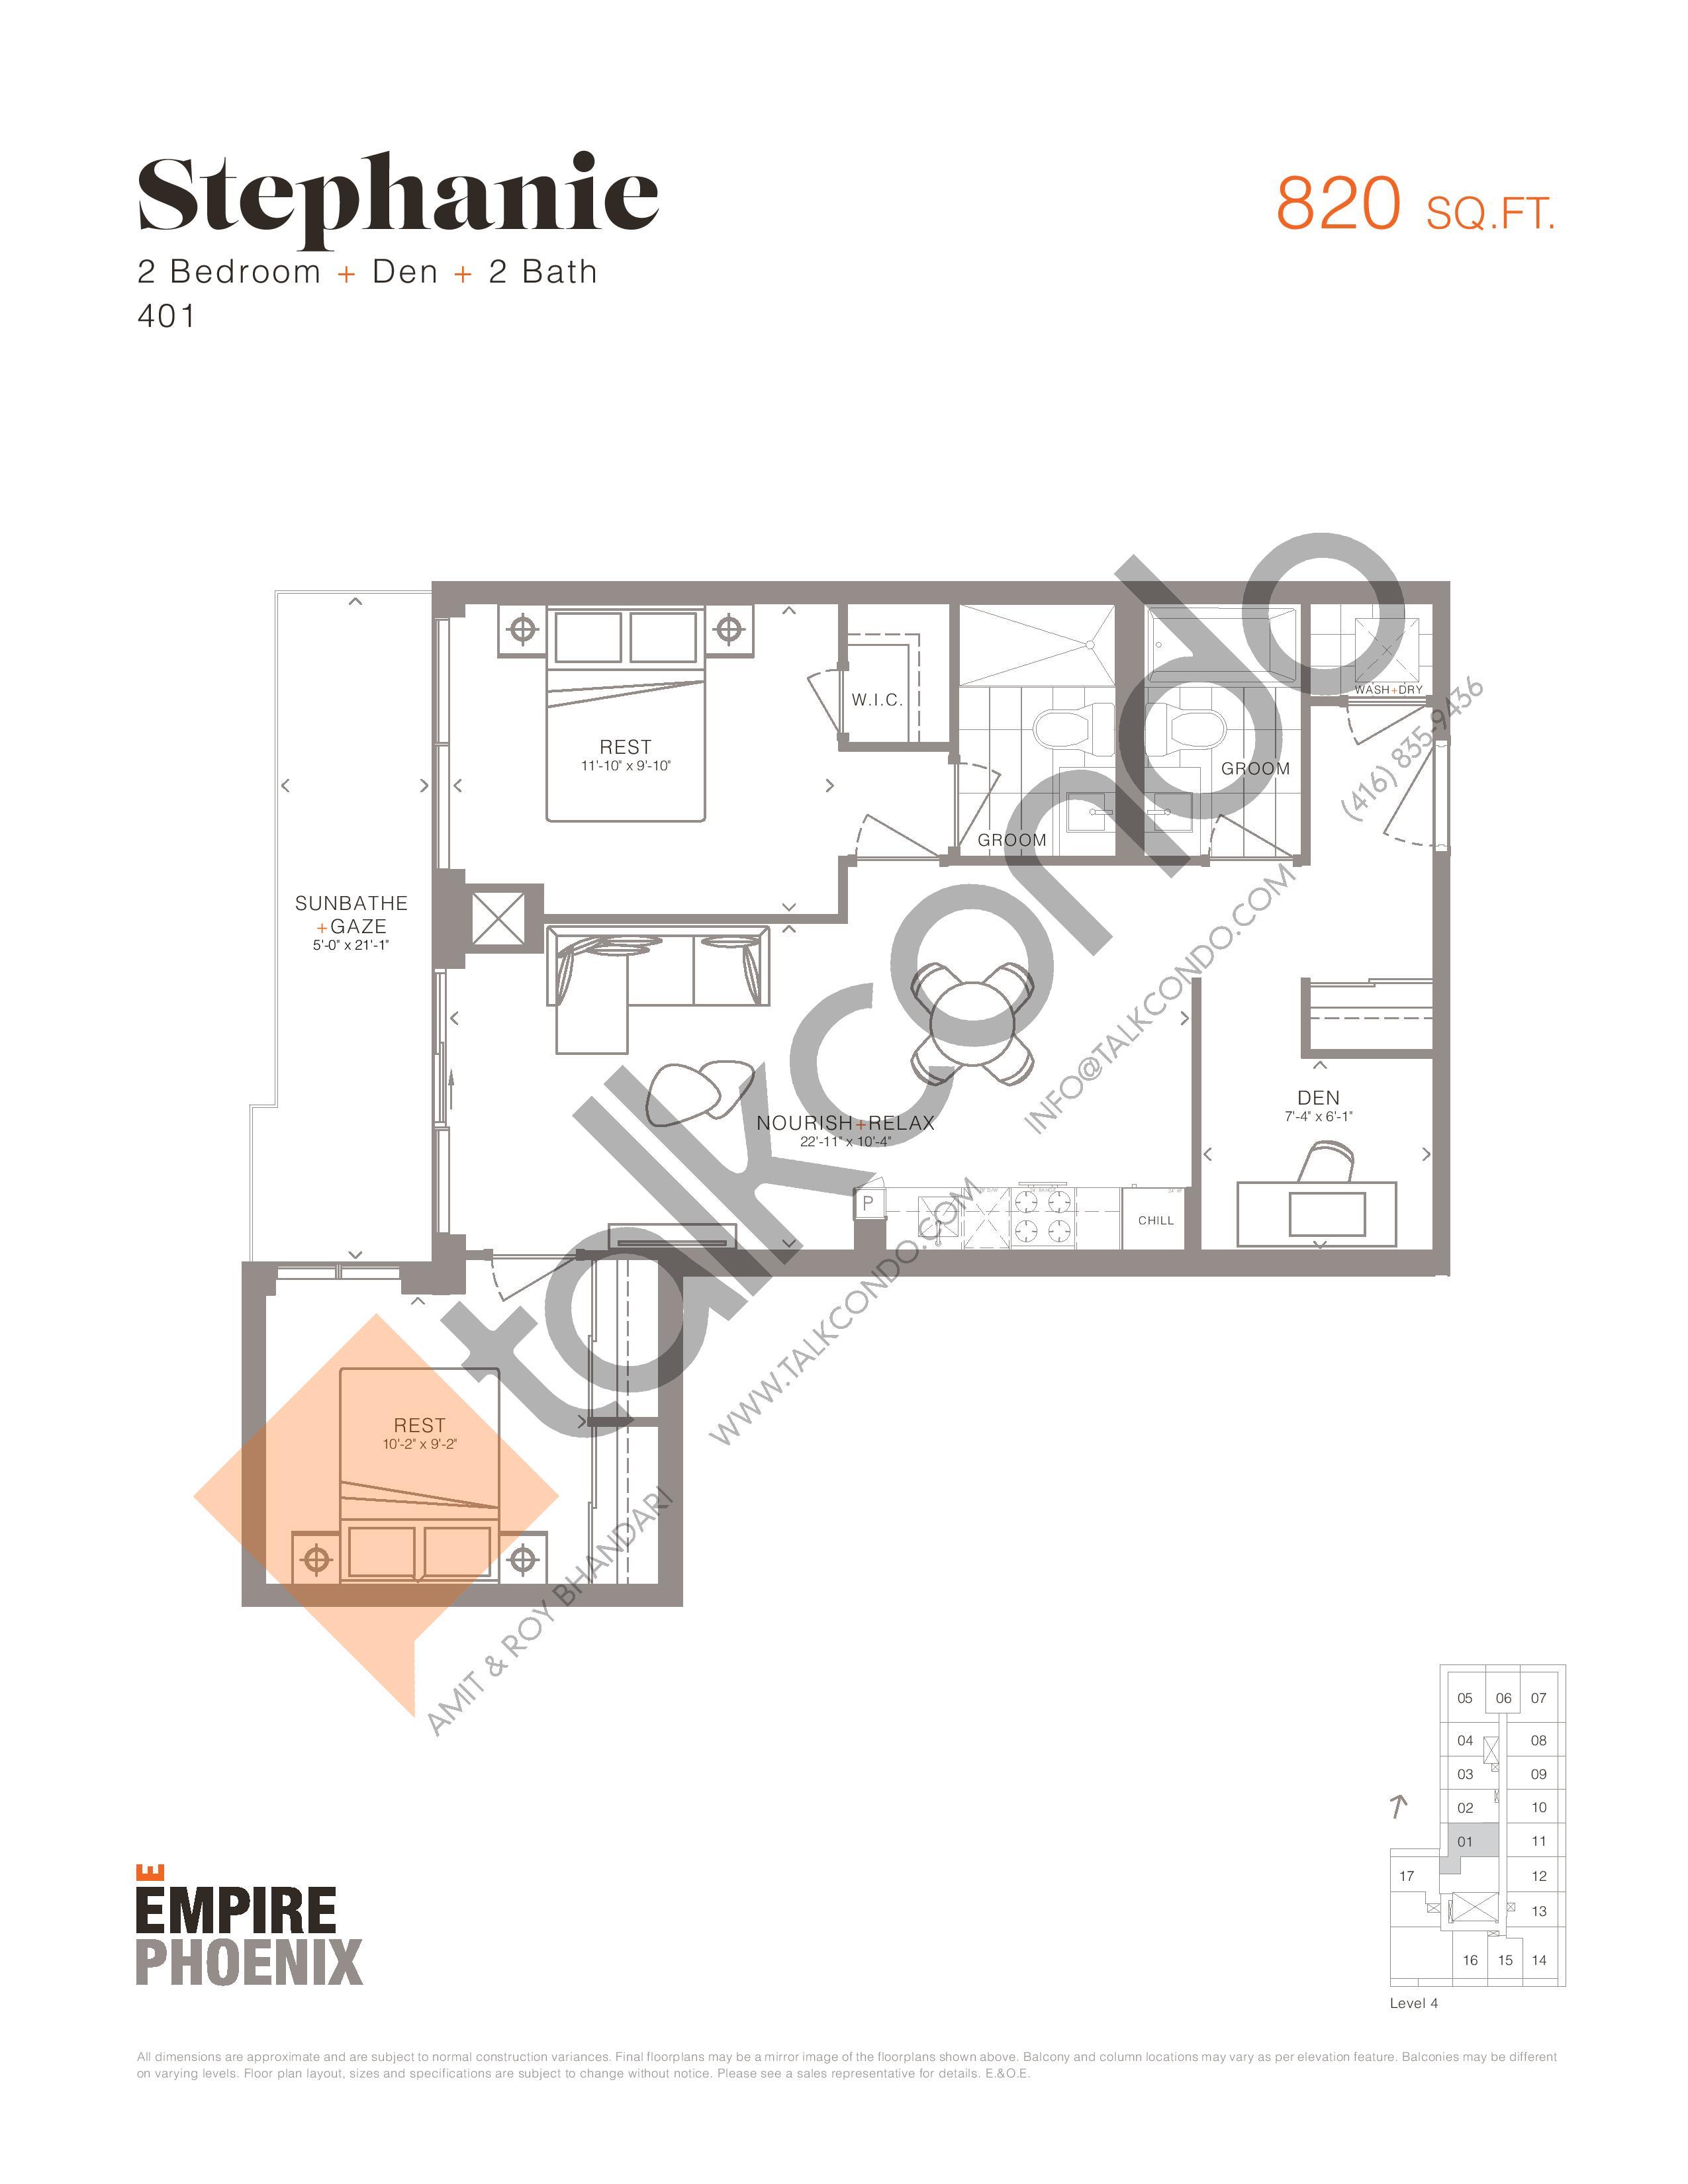 Stephanie Floor Plan at Empire Phoenix Condos - 820 sq.ft